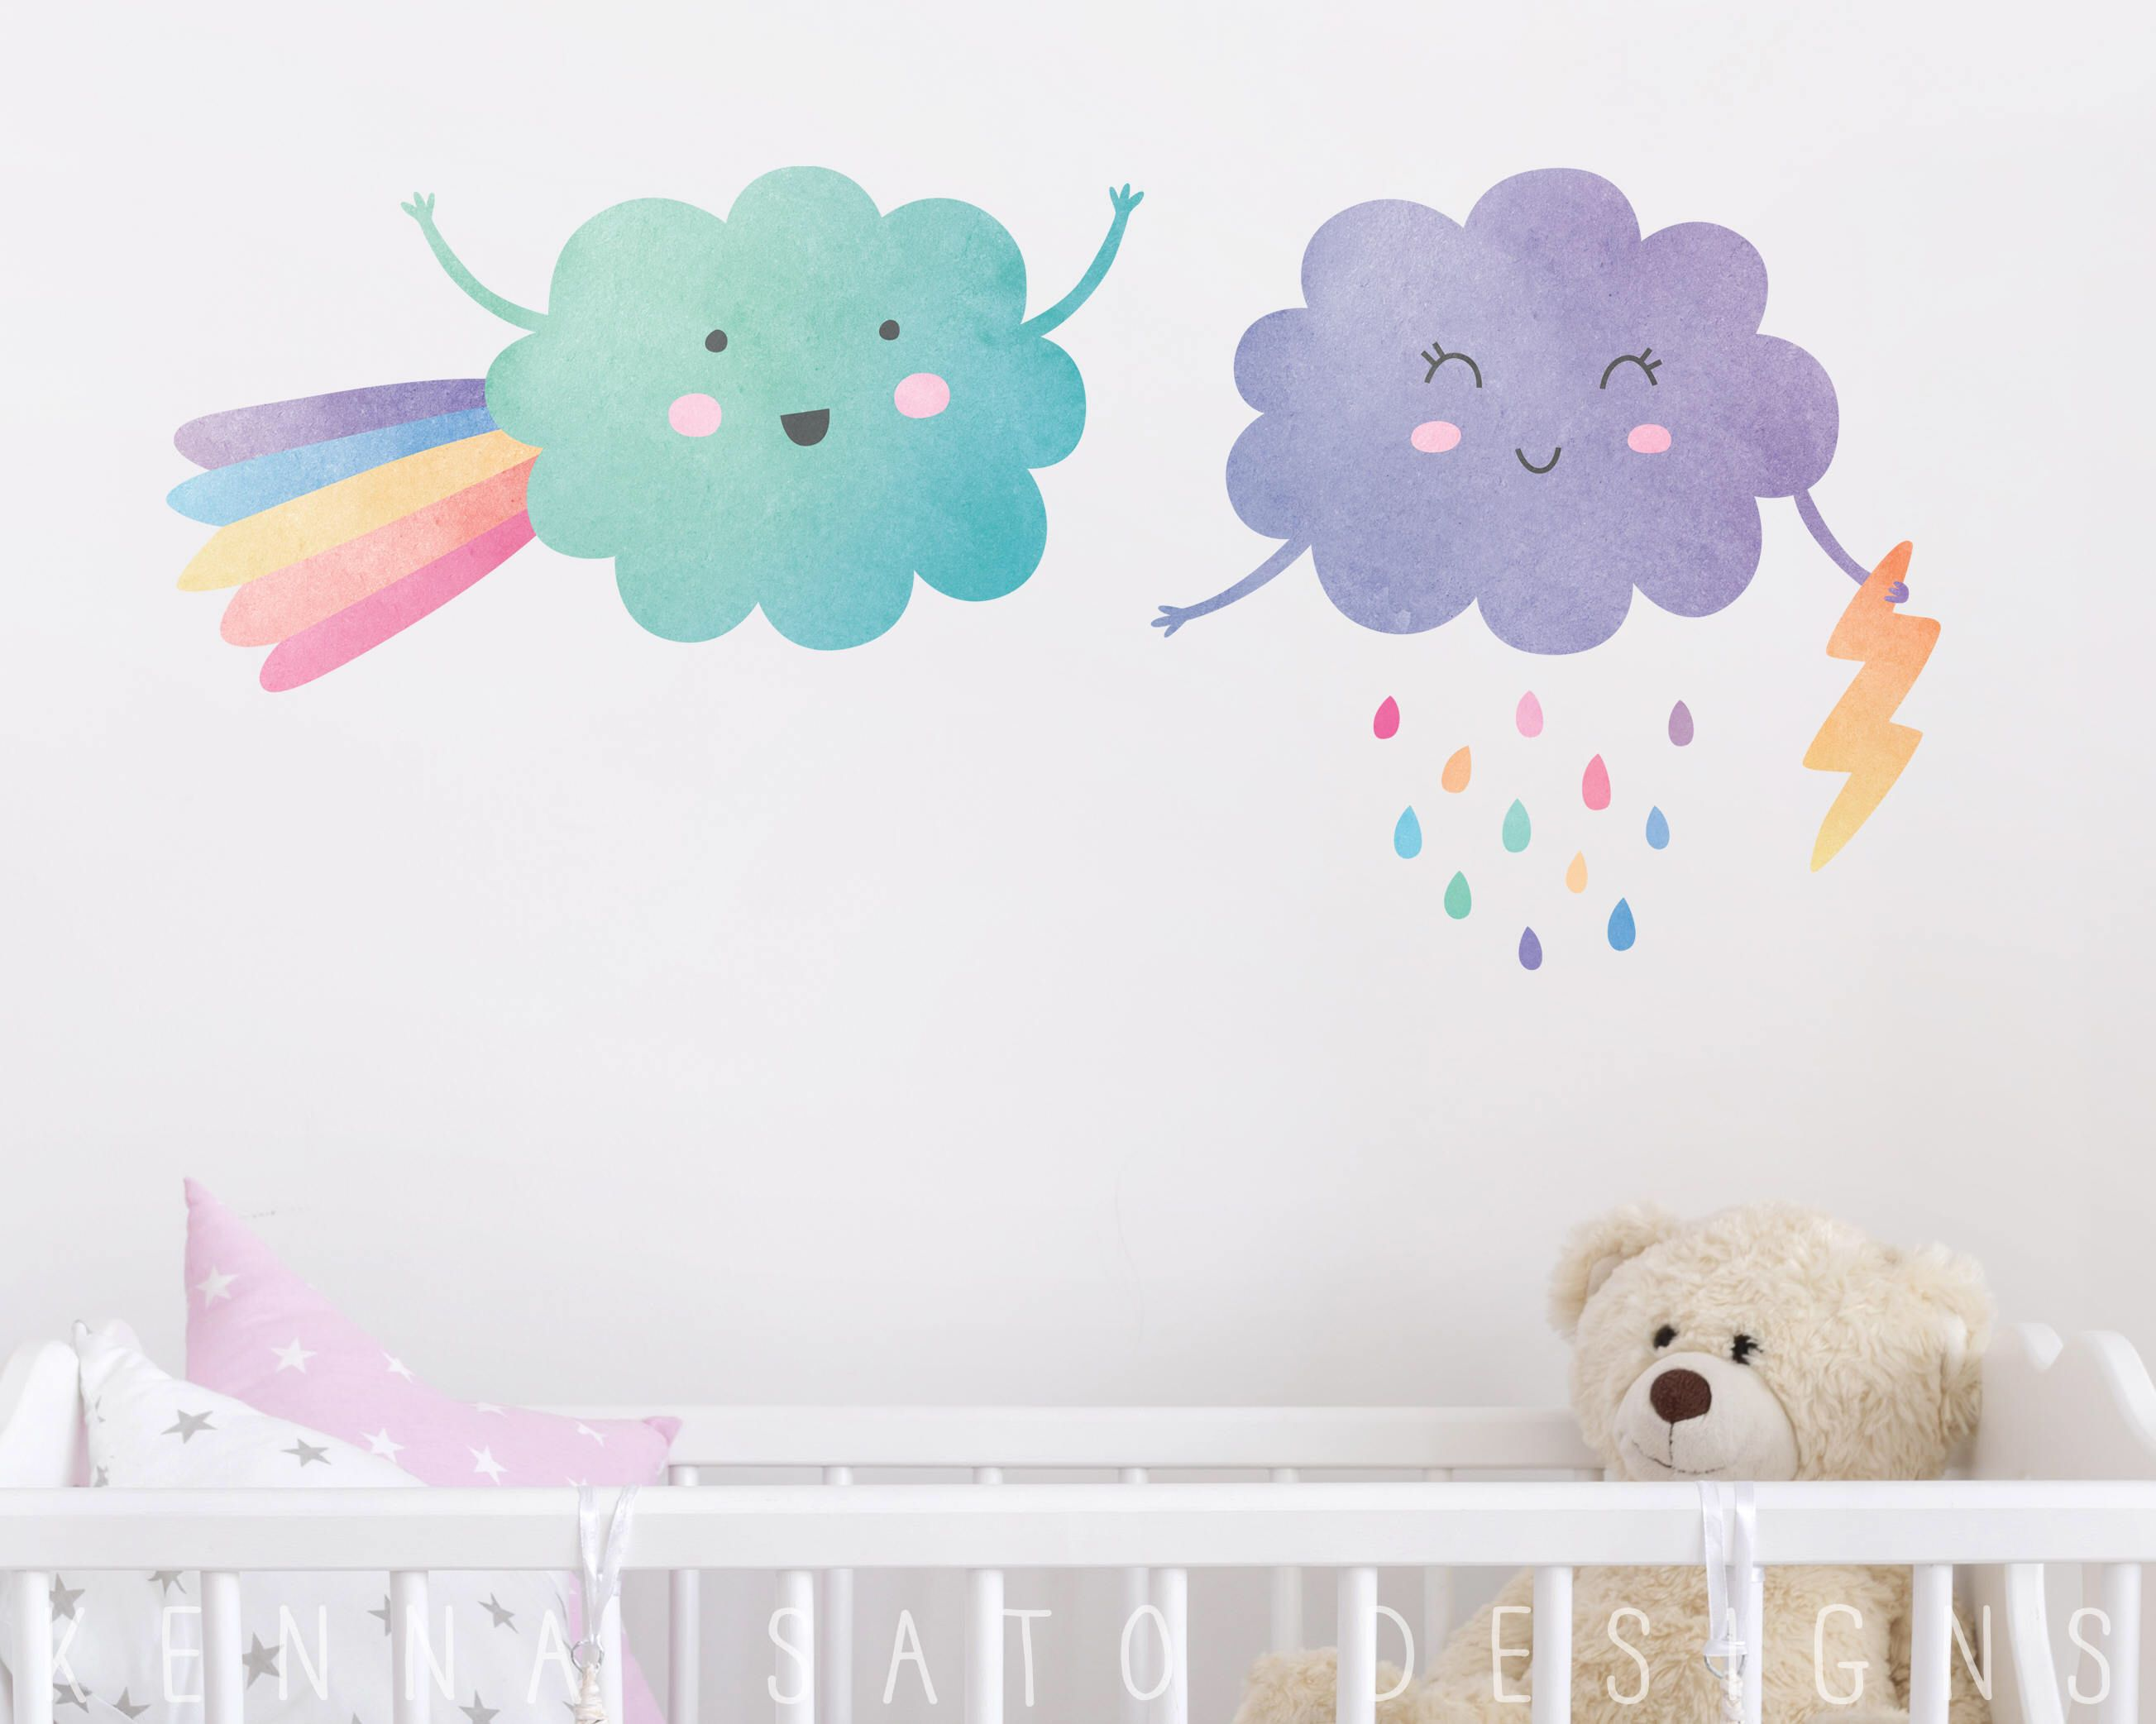 Watercolor Cloud & Raindrop Wall Decals  Reusable Wall Decals,